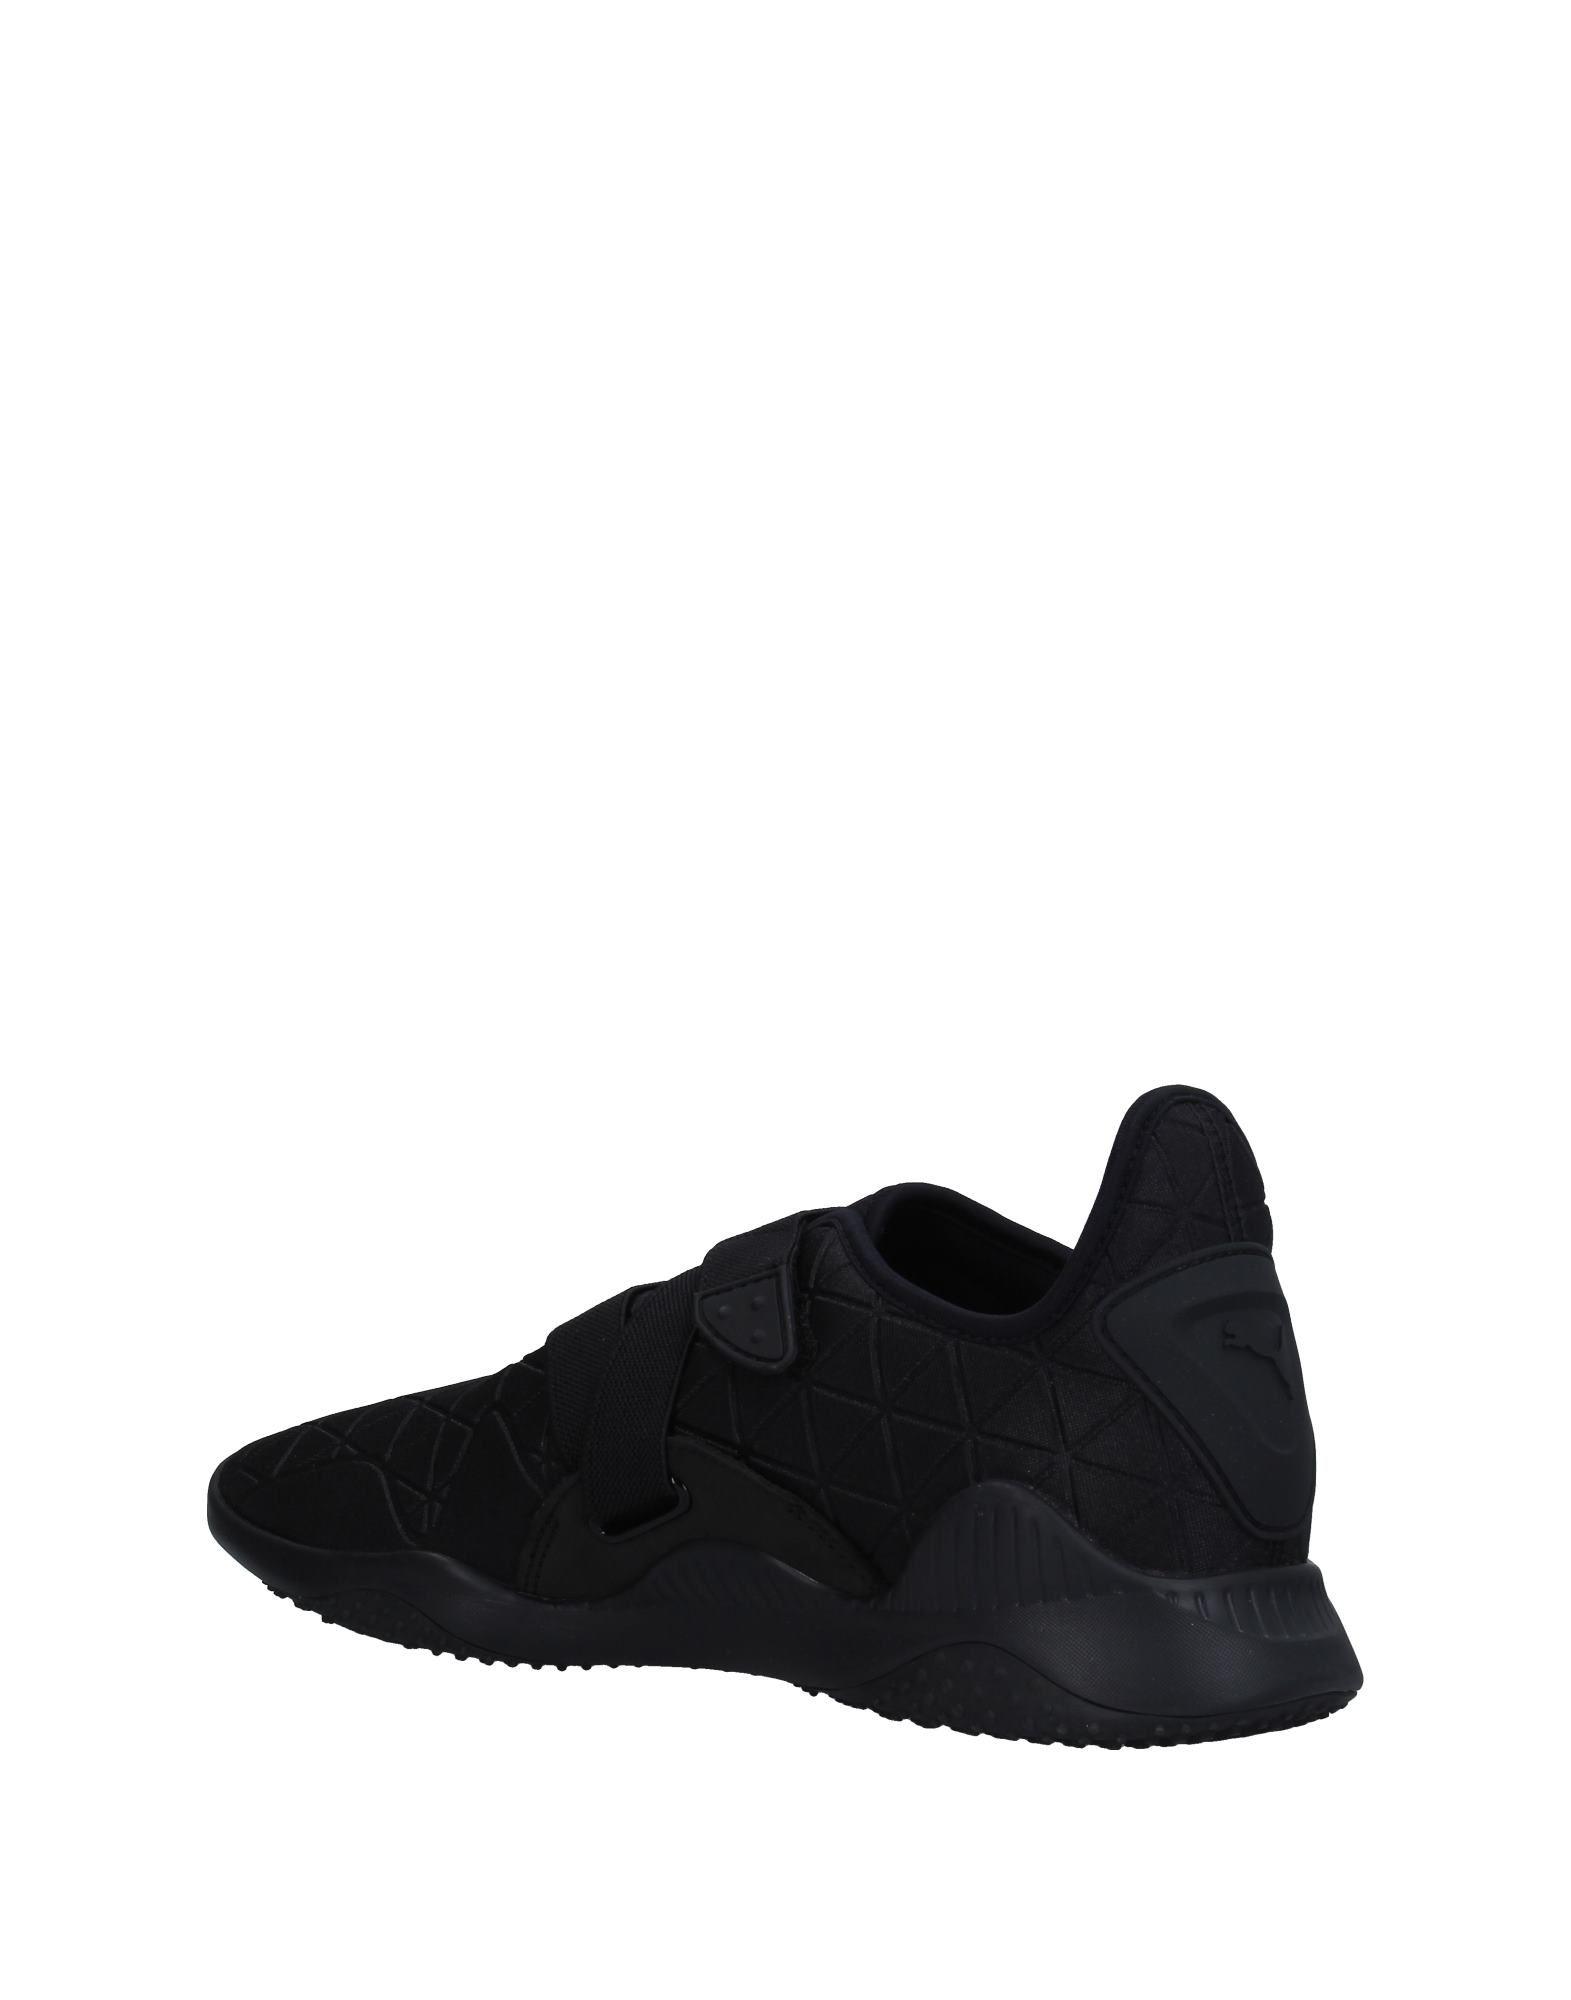 Puma Sneakers 11326549CI Herren  11326549CI Sneakers Heiße Schuhe b34f23